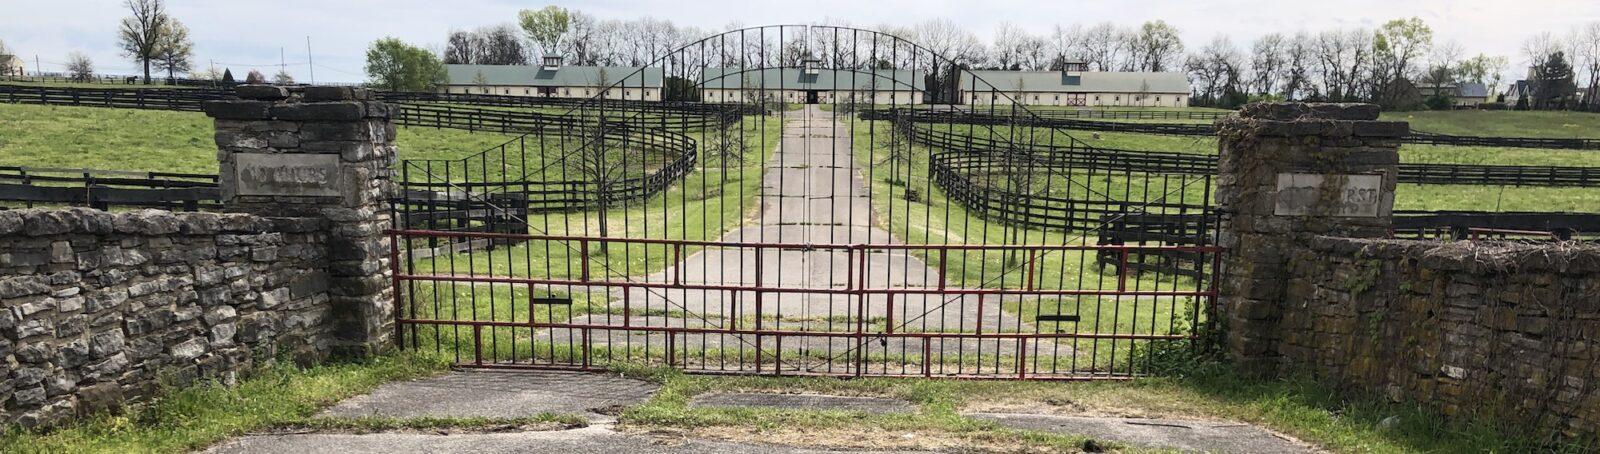 Old Gates of Almahurst